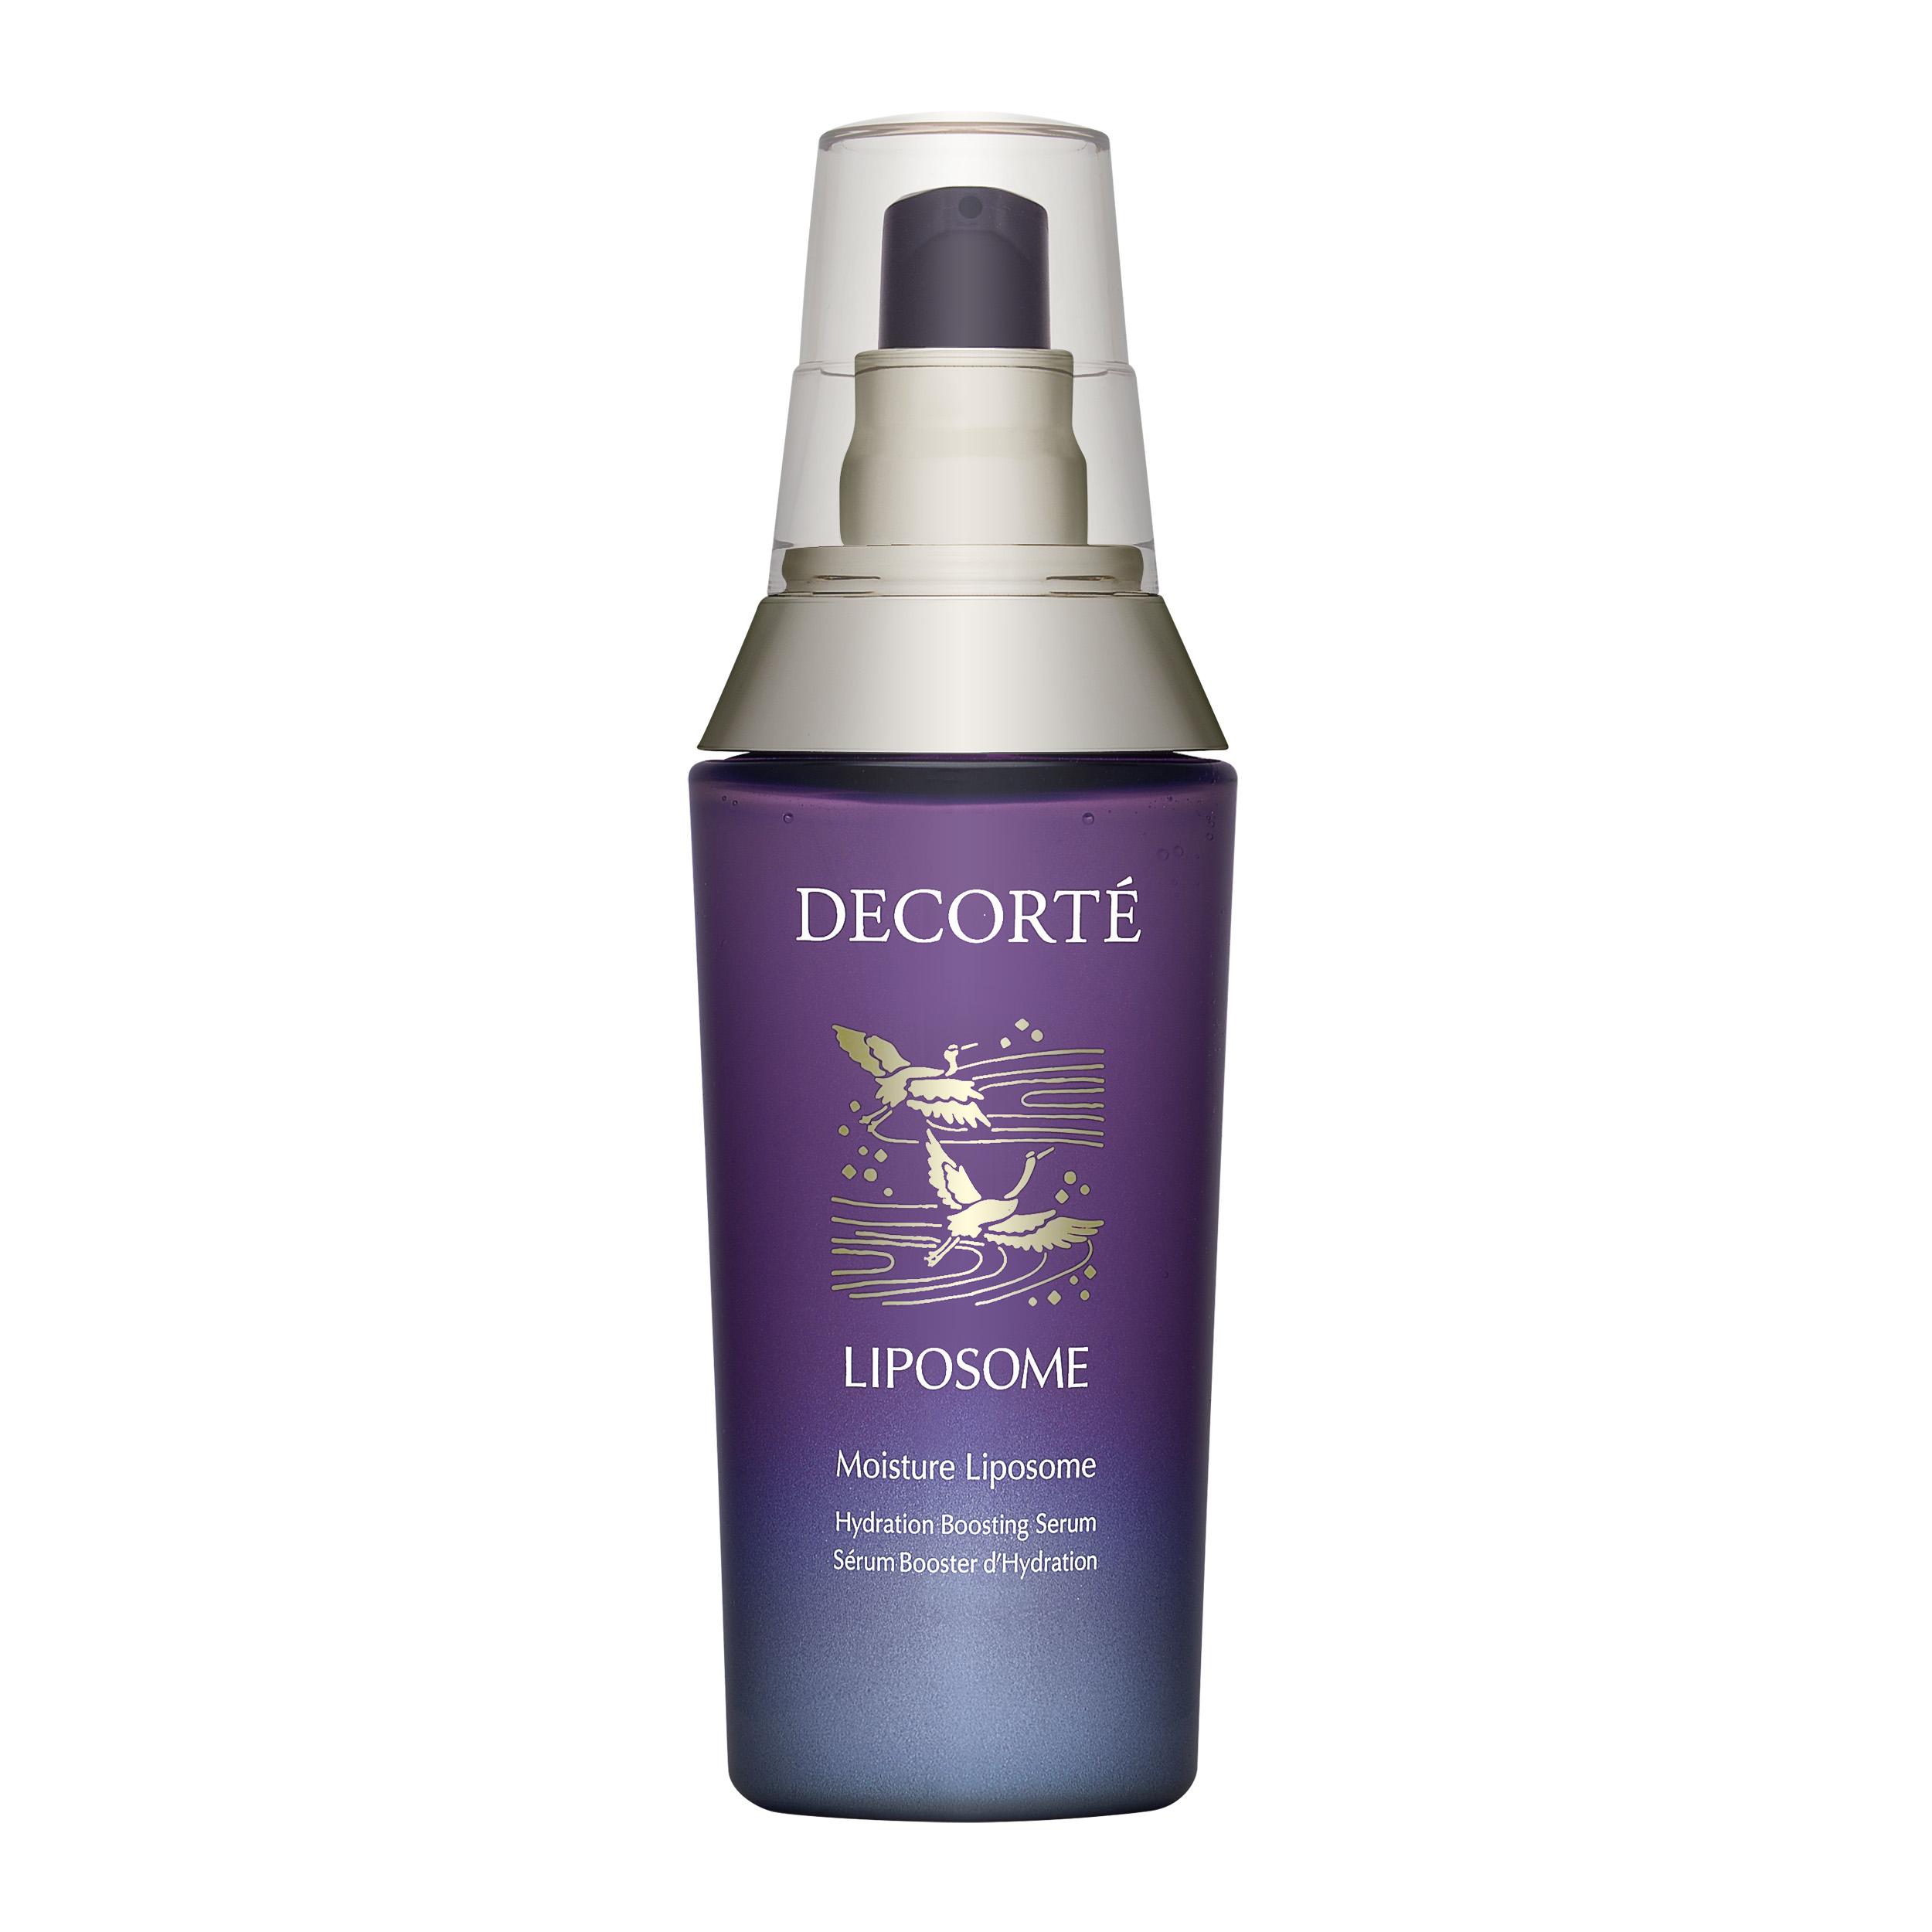 COSME DECORTE Moisture Liposome  Hydration Boosting Serum  2.8oz, 85ml ( Limited Luxury Size / 限量豪华装 )